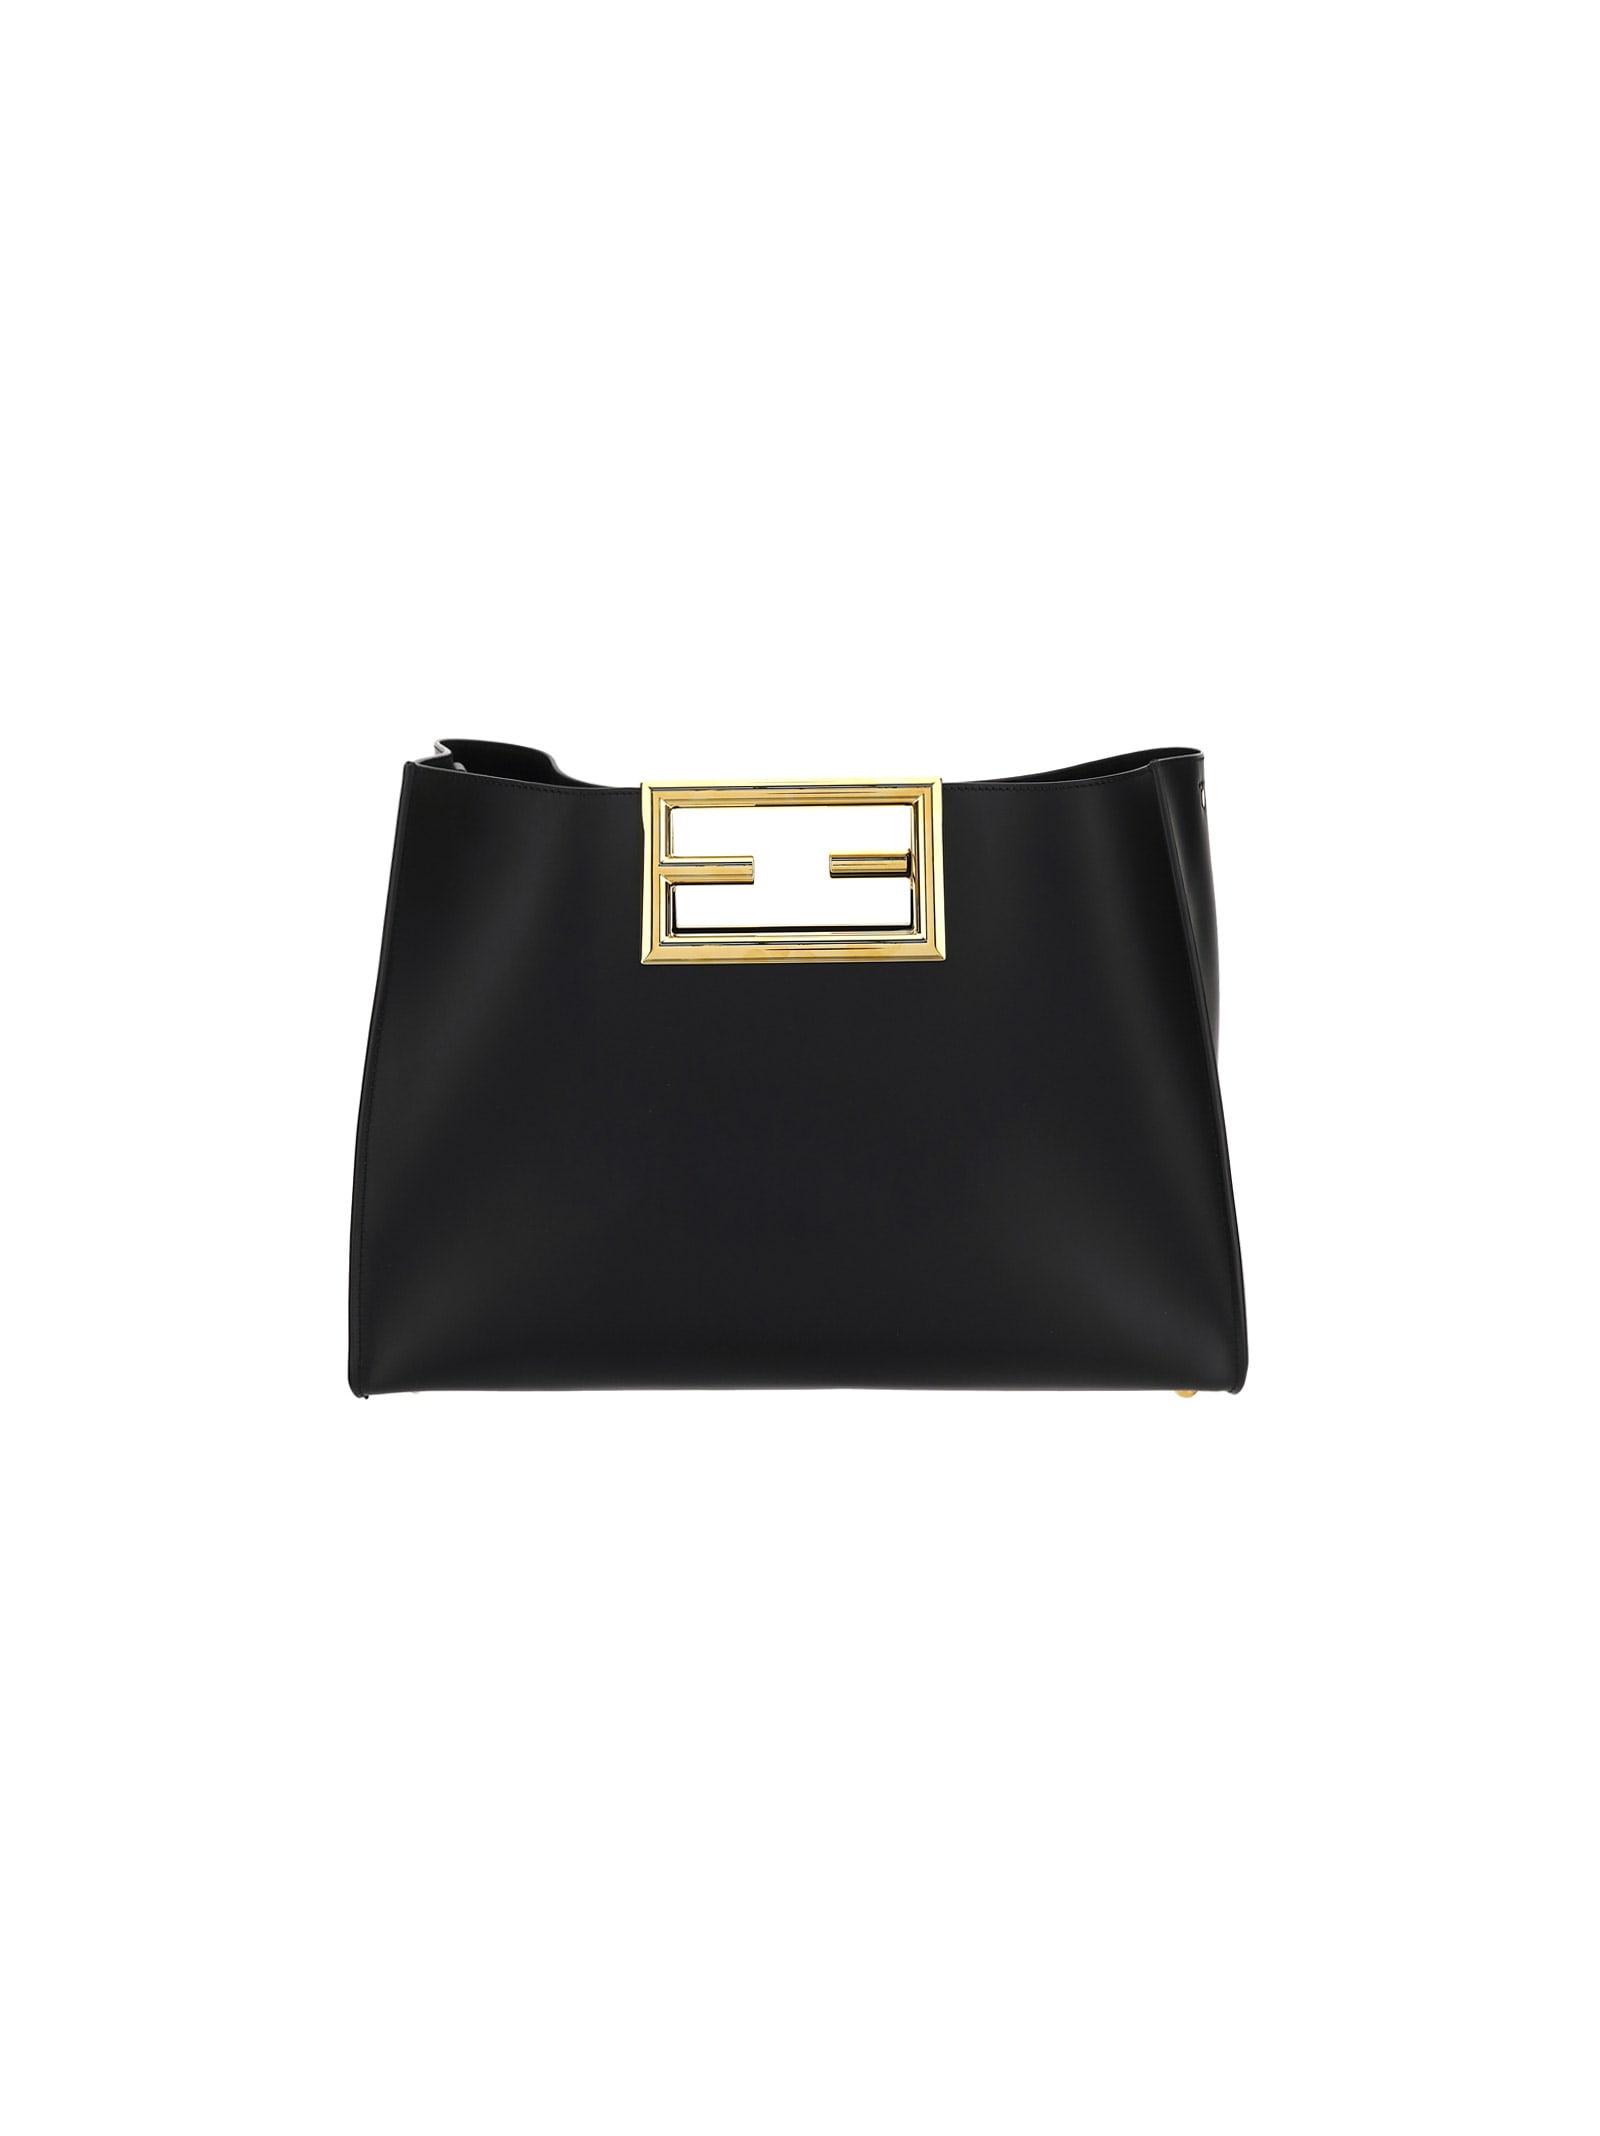 Fendi Shoulder Bag In Nero+oro Soft